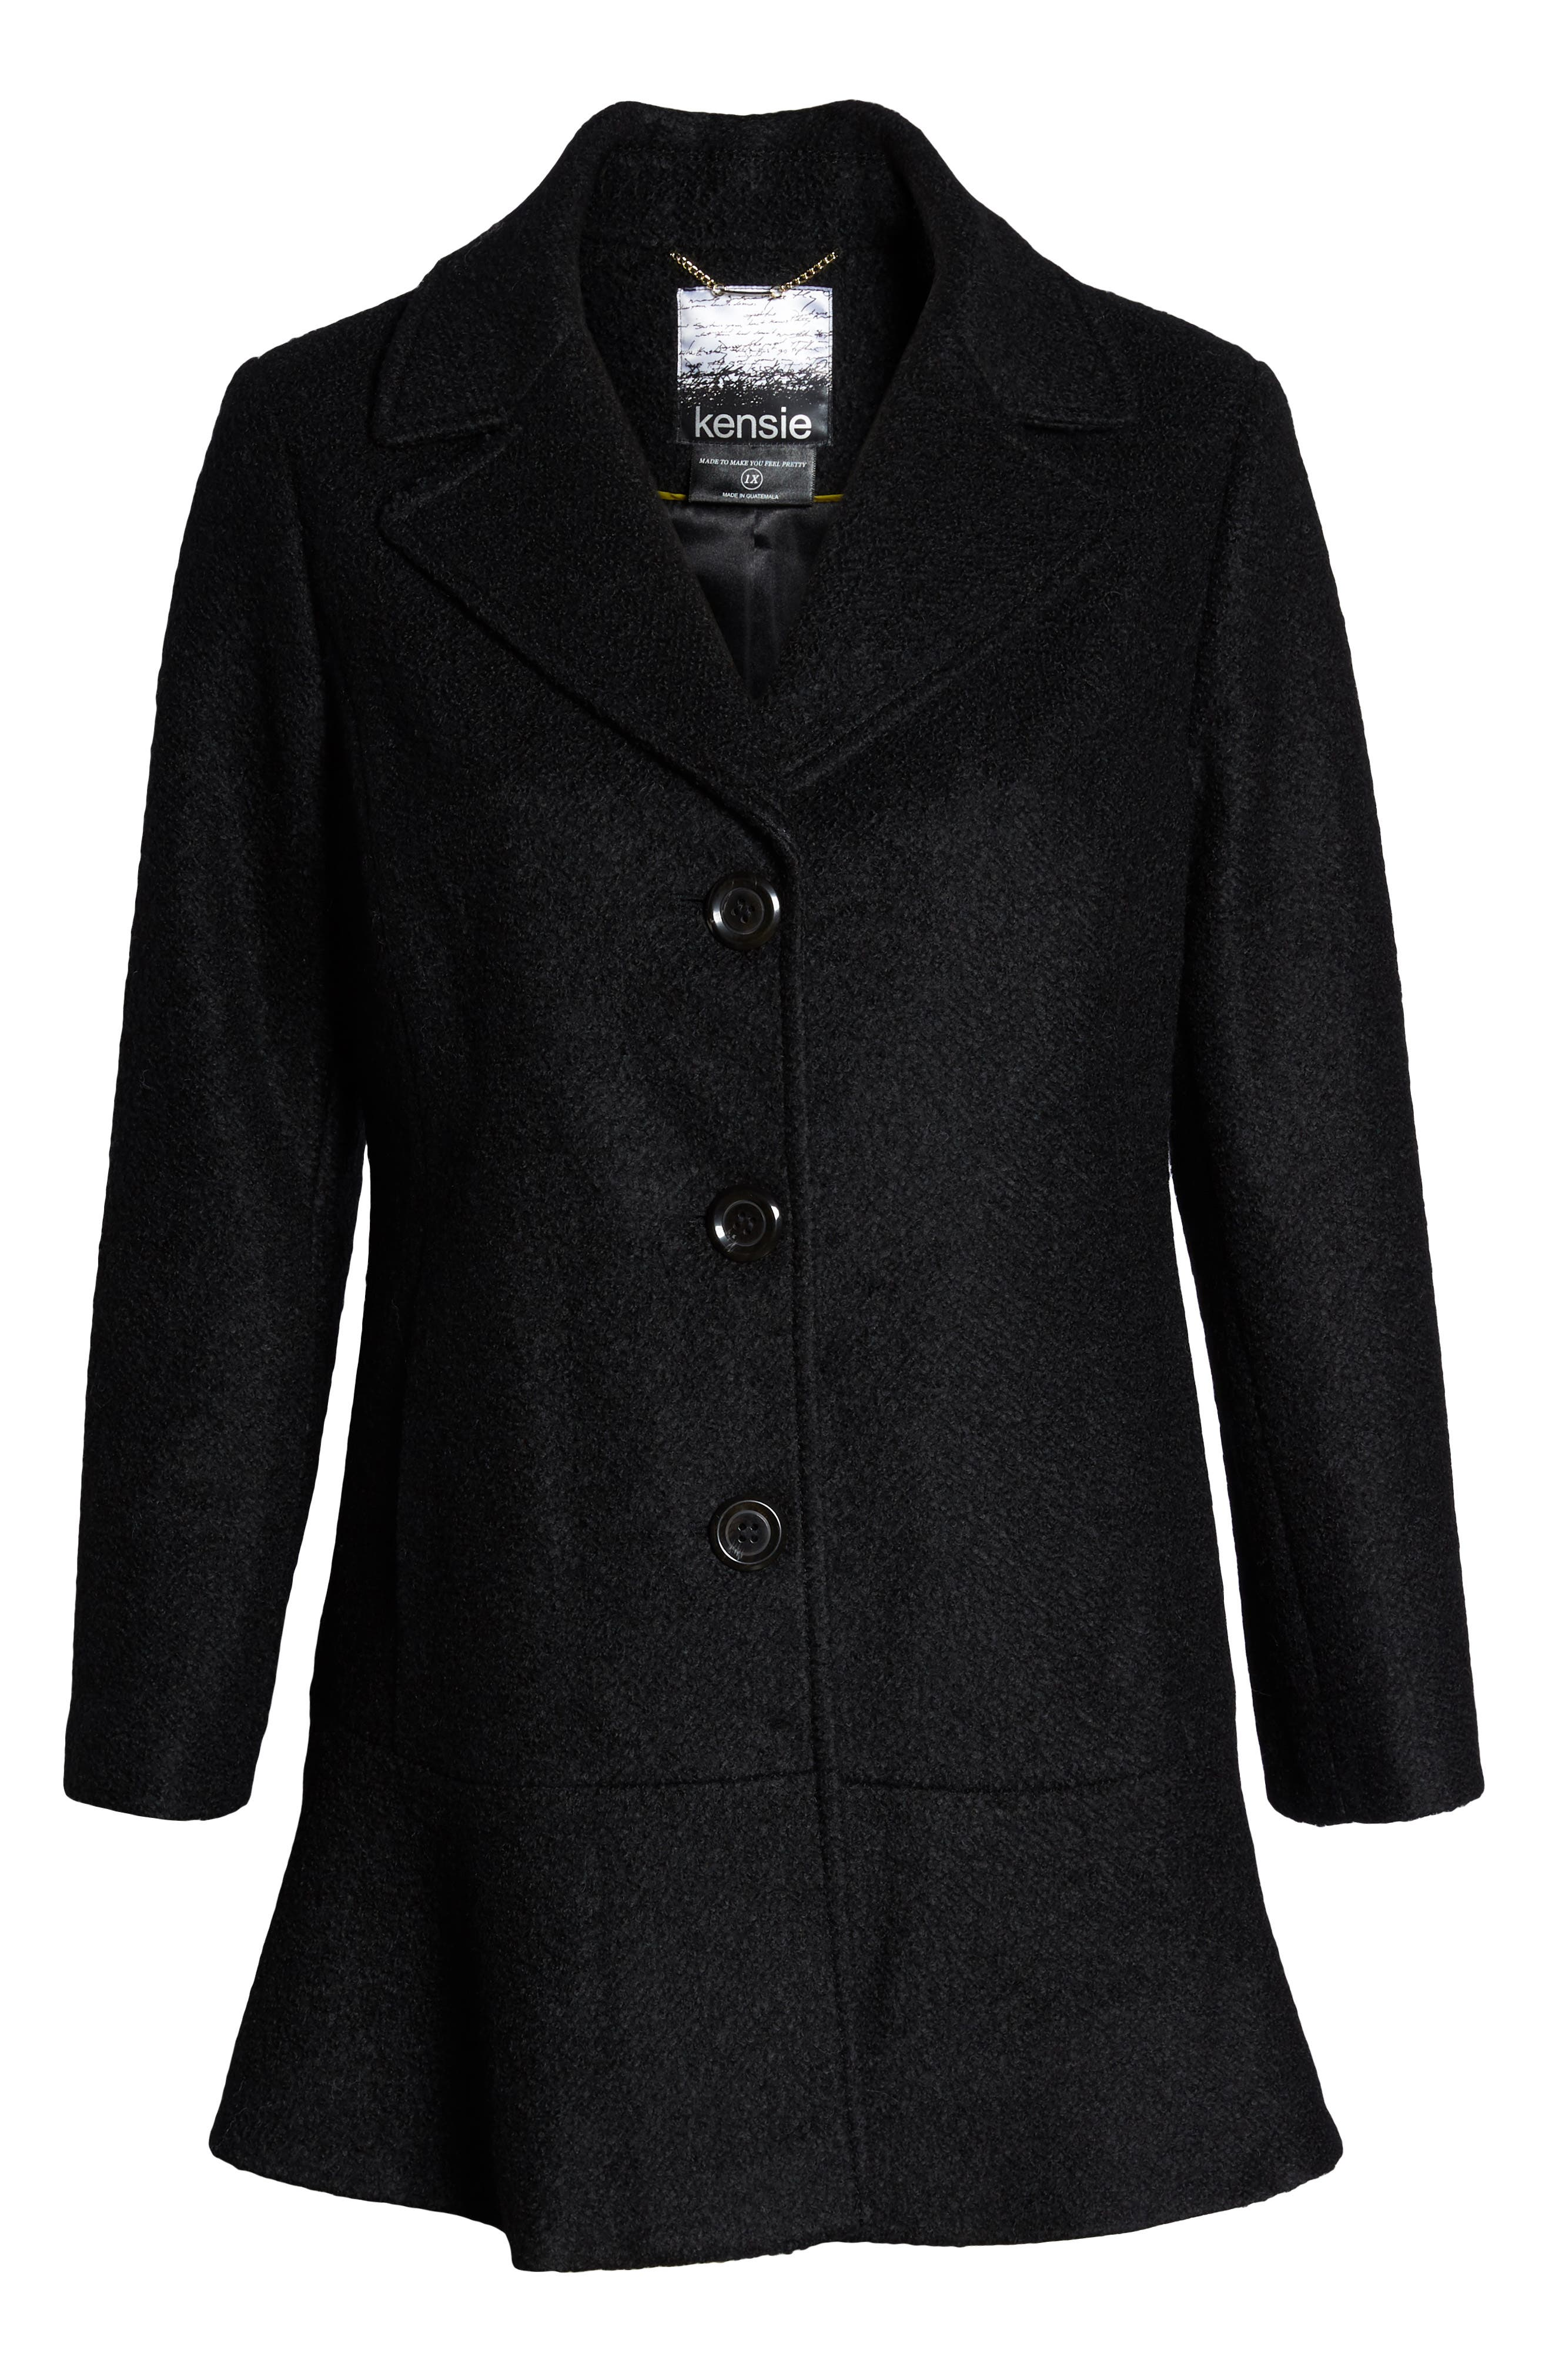 KENSIE, Notch Lapel Peplum Coat, Alternate thumbnail 6, color, BLACK